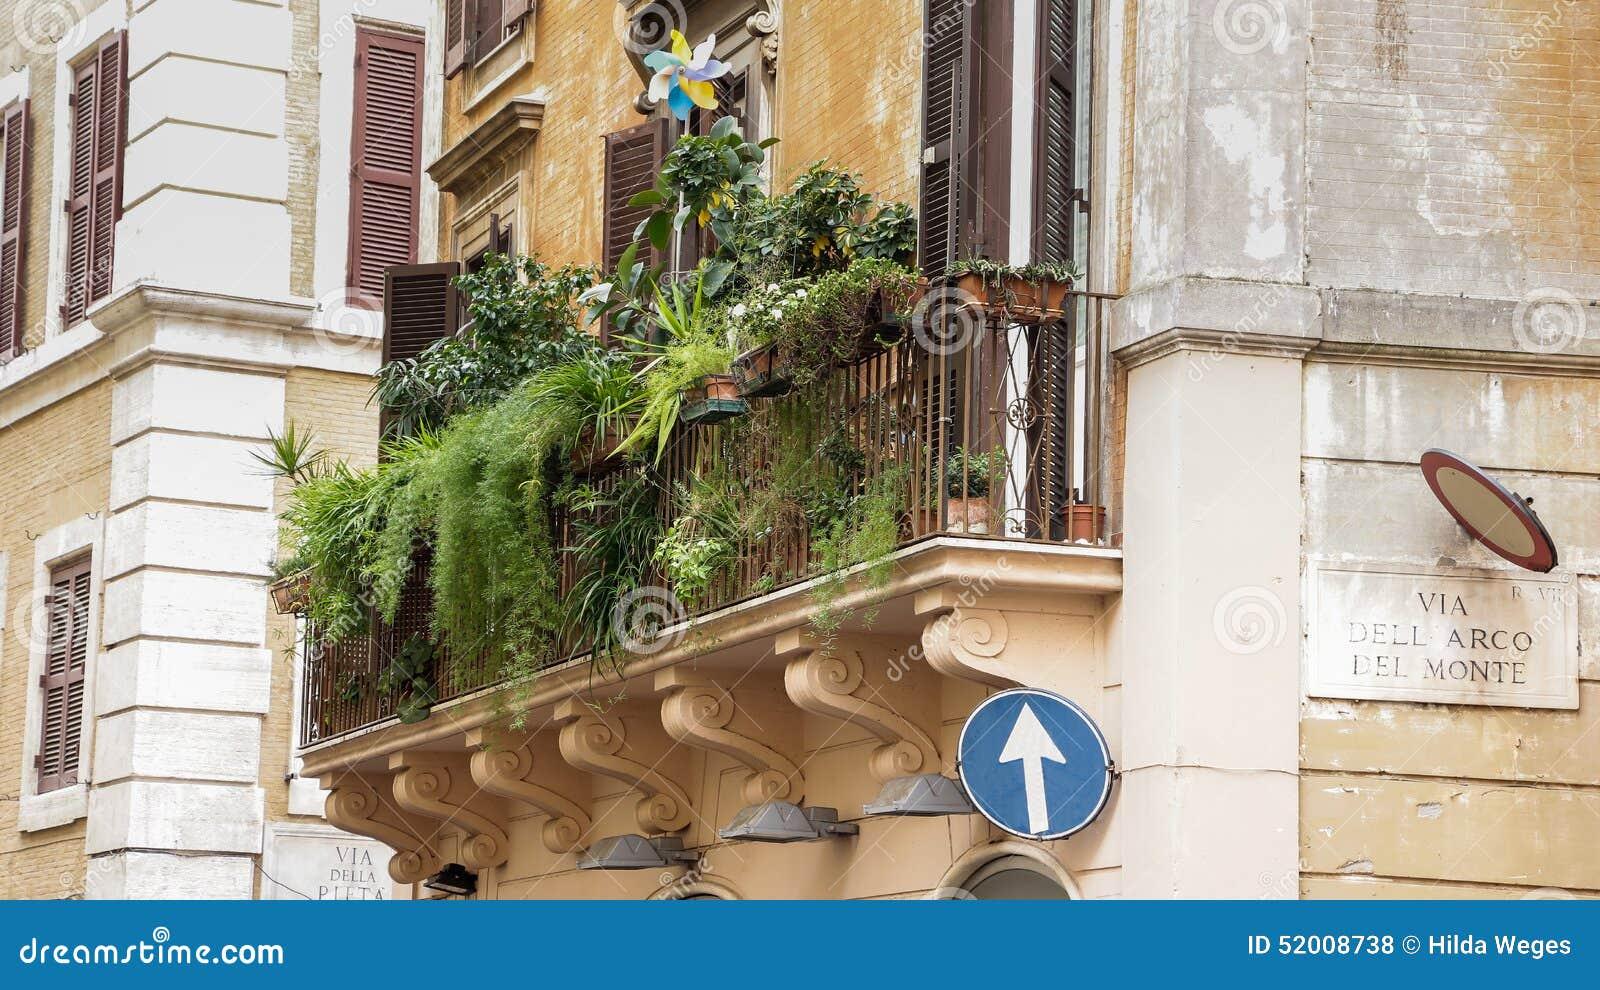 Apartment Balcony Flowers: Wonderful balcony garden ideas to bring ...